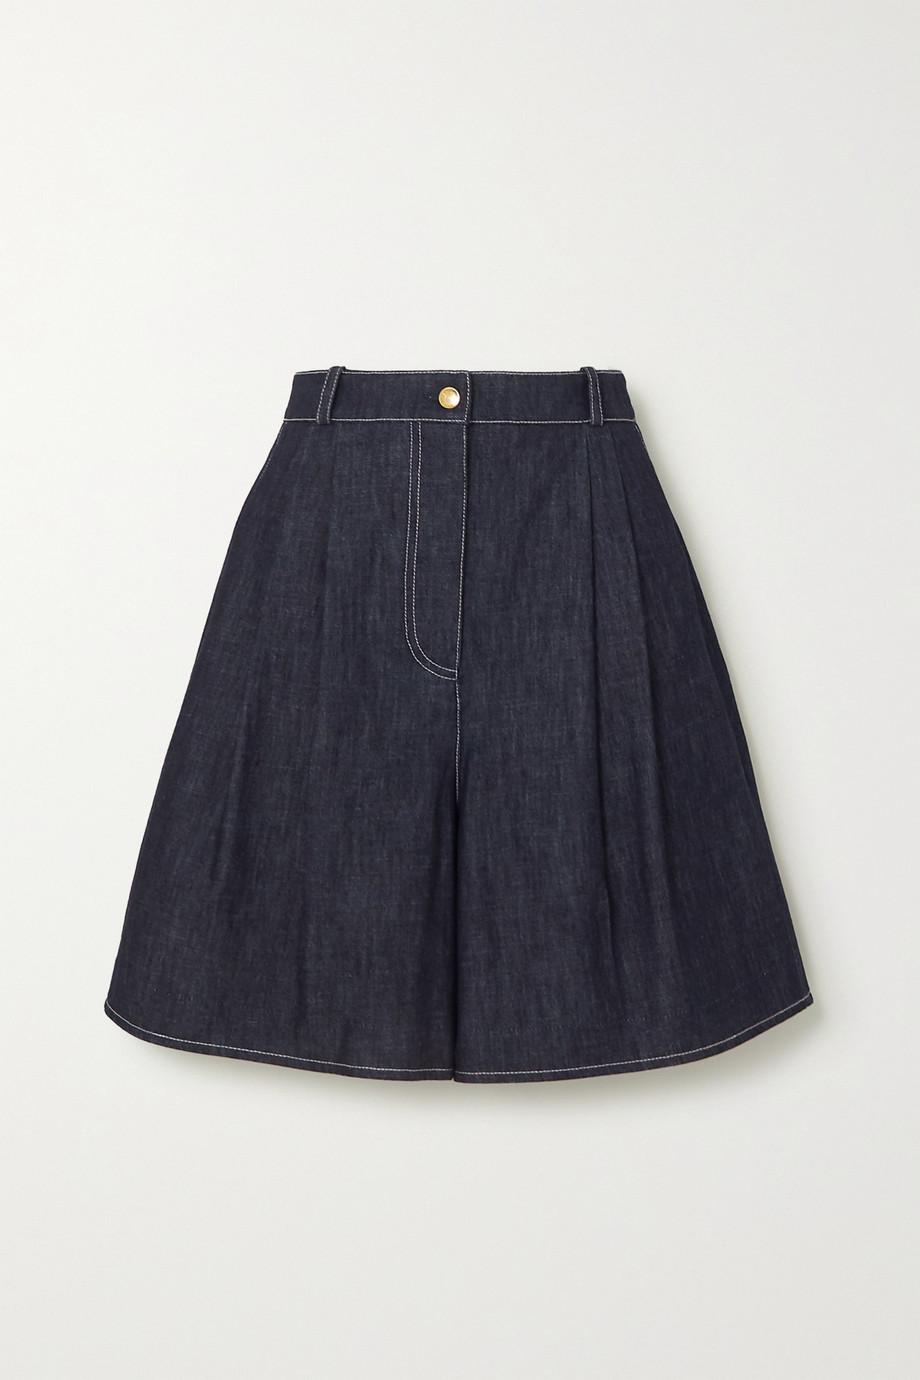 Emilia Wickstead Roger denim shorts